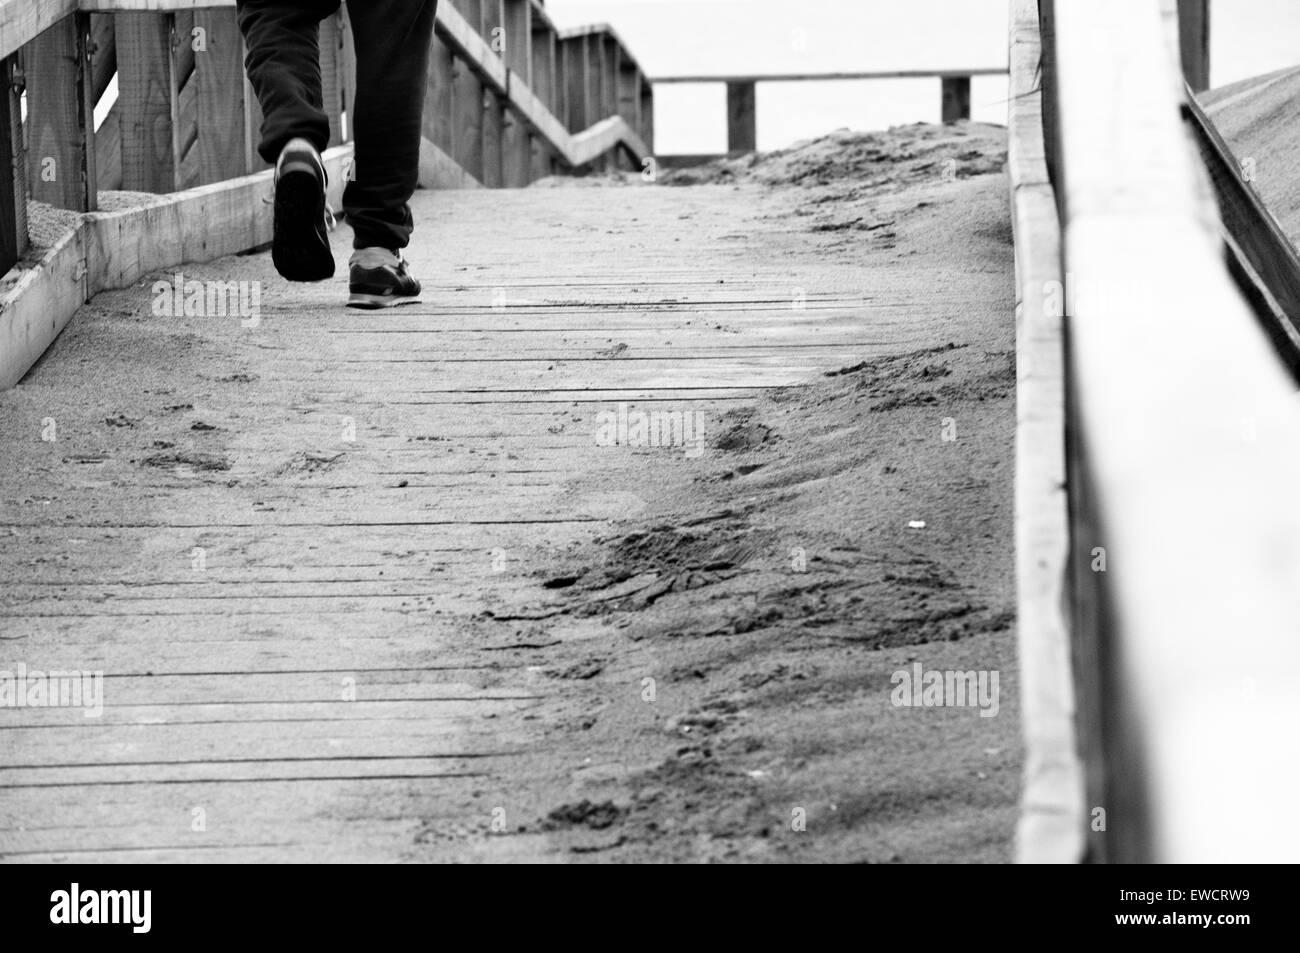 A lonely boy walking on a wooden bridge near the sea stock image